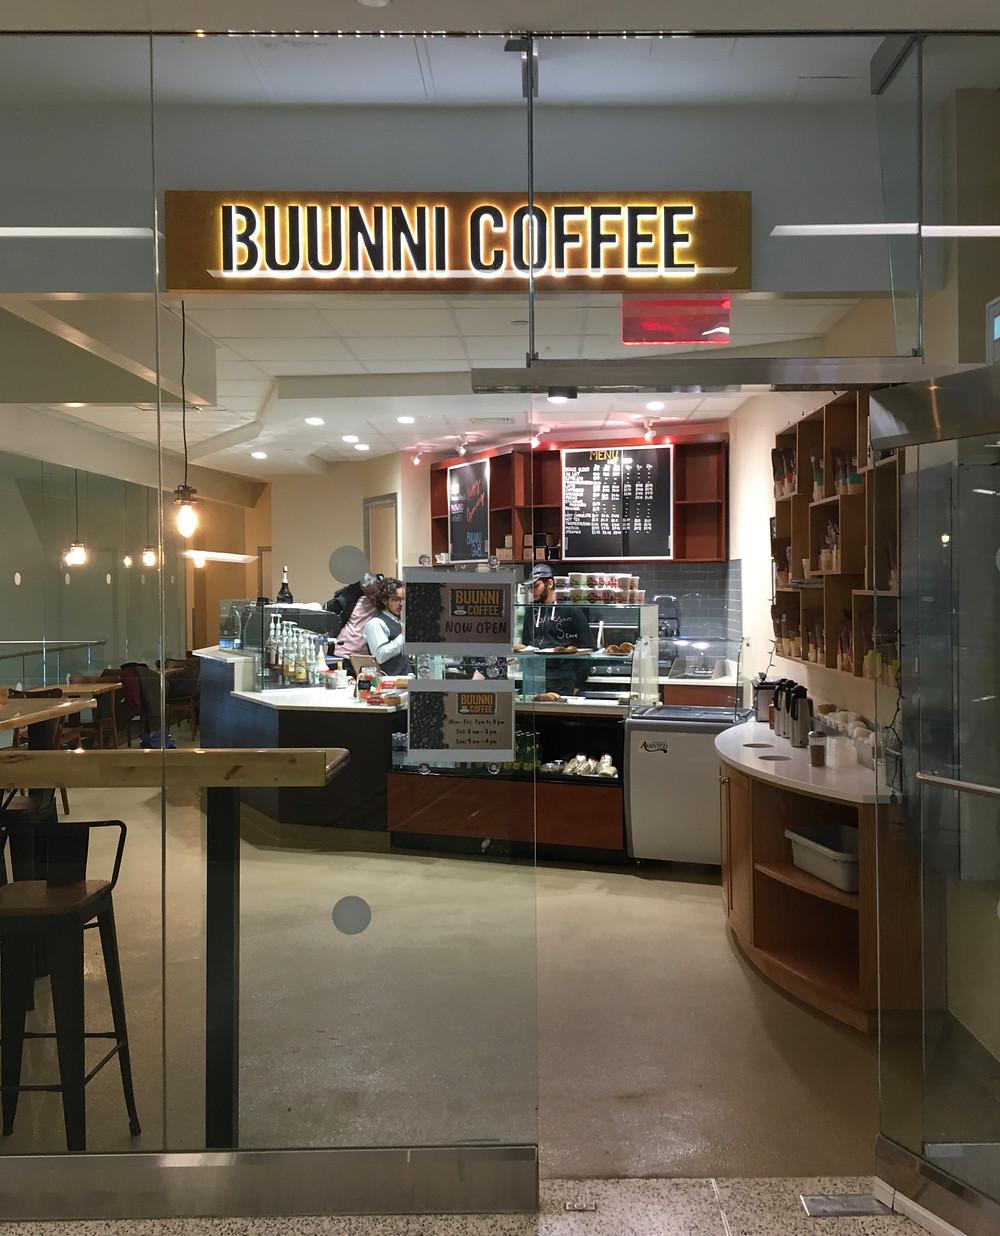 The new Buunni Coffee in the George Washington Bridge Bus Terminal Market